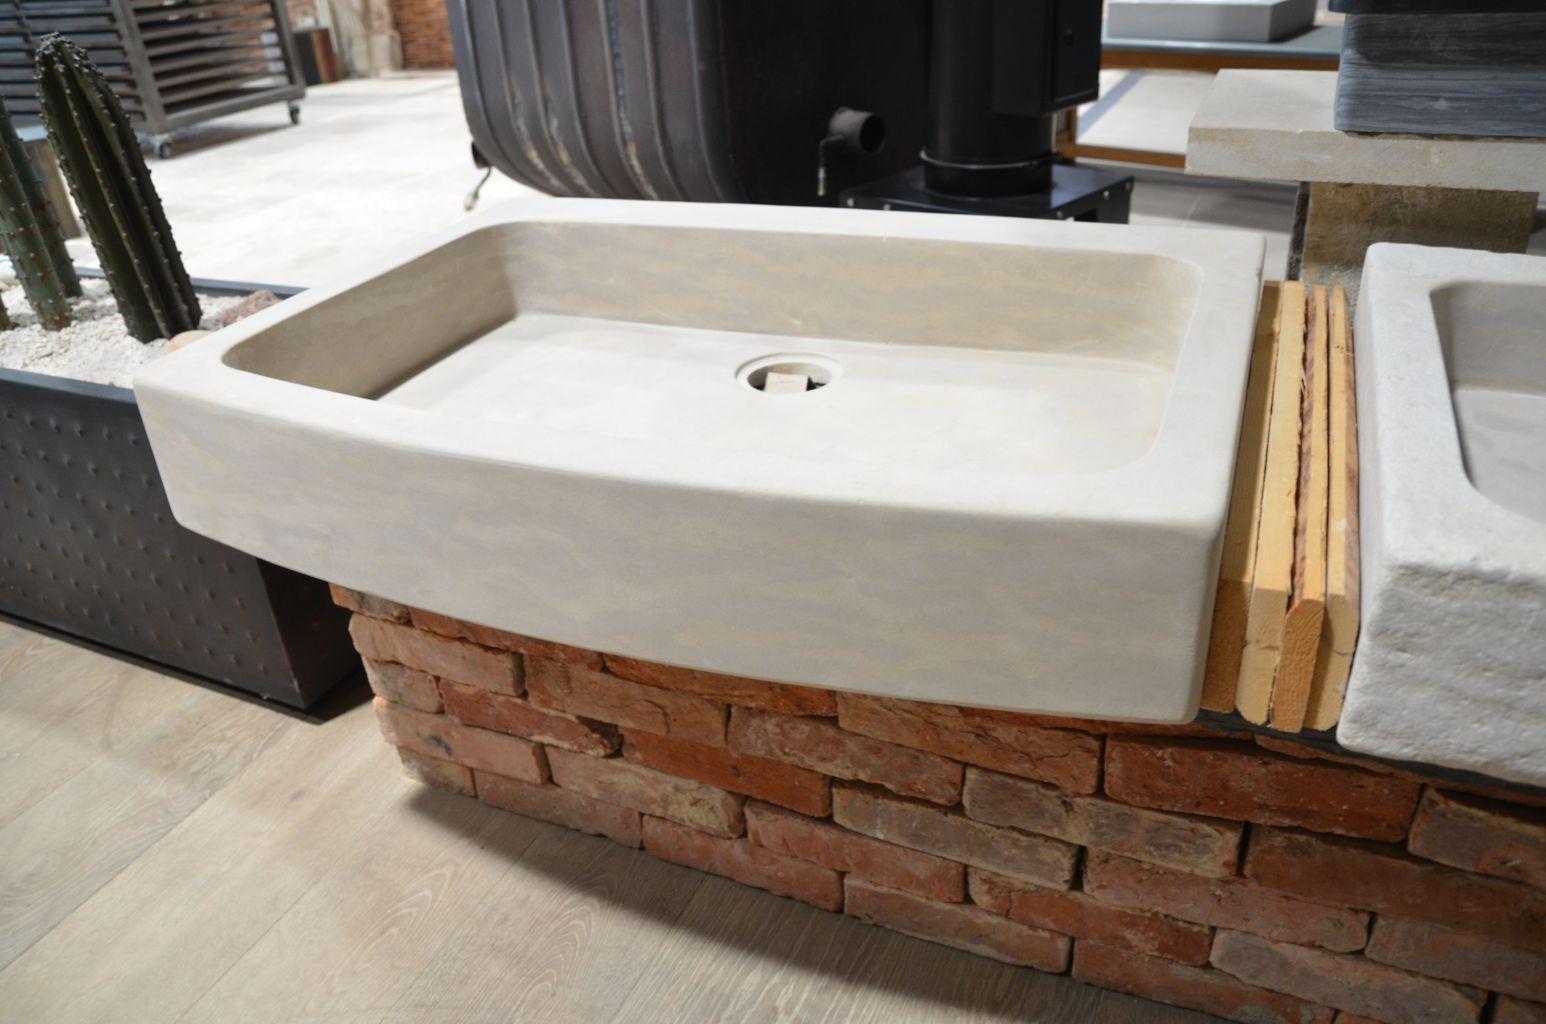 evier en pierre naturelle beige rectangulaire bca. Black Bedroom Furniture Sets. Home Design Ideas